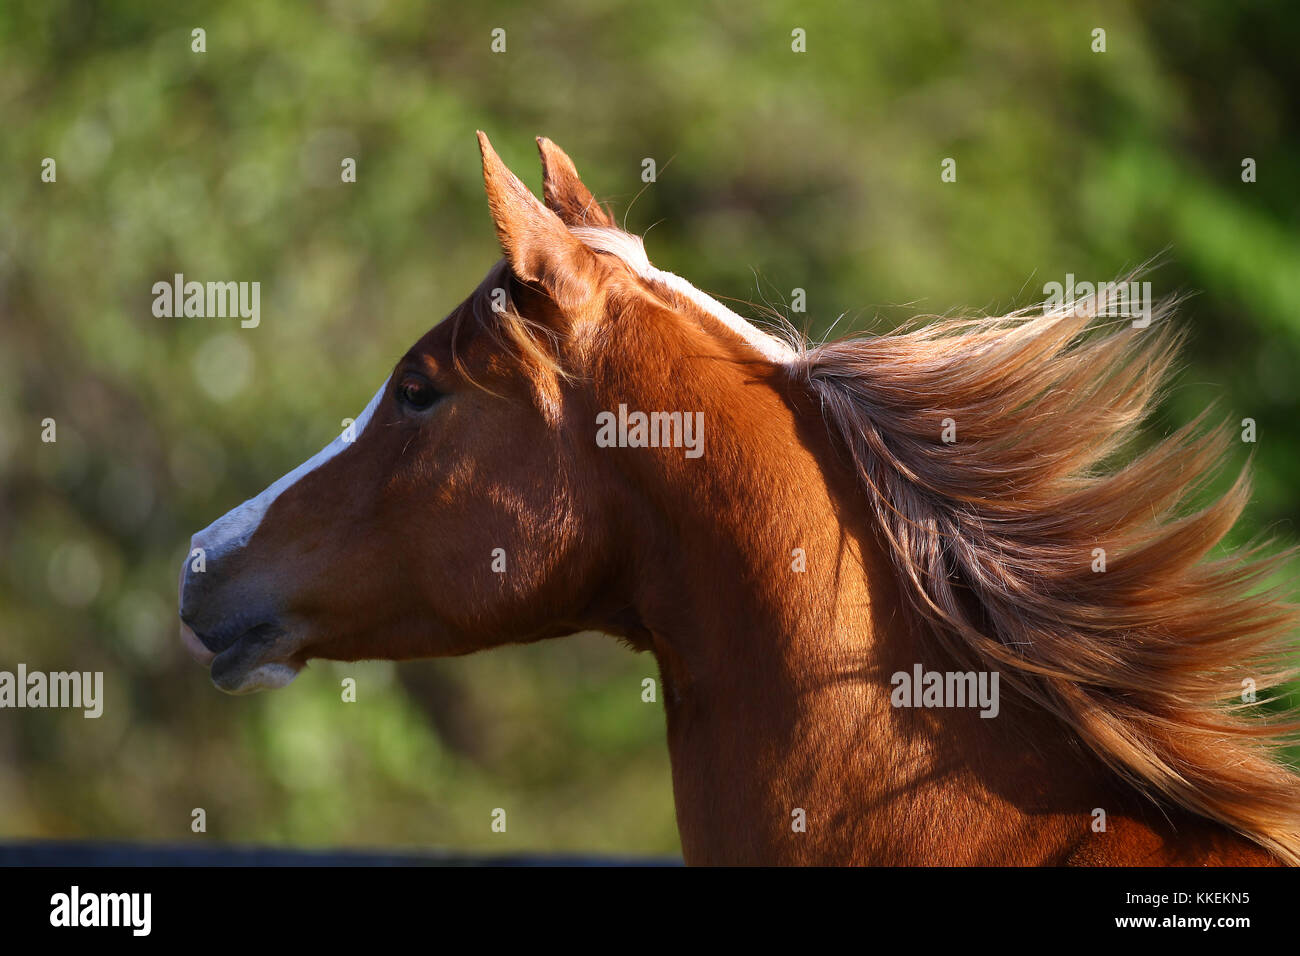 Chestnut Arab Headshot - Stock Image